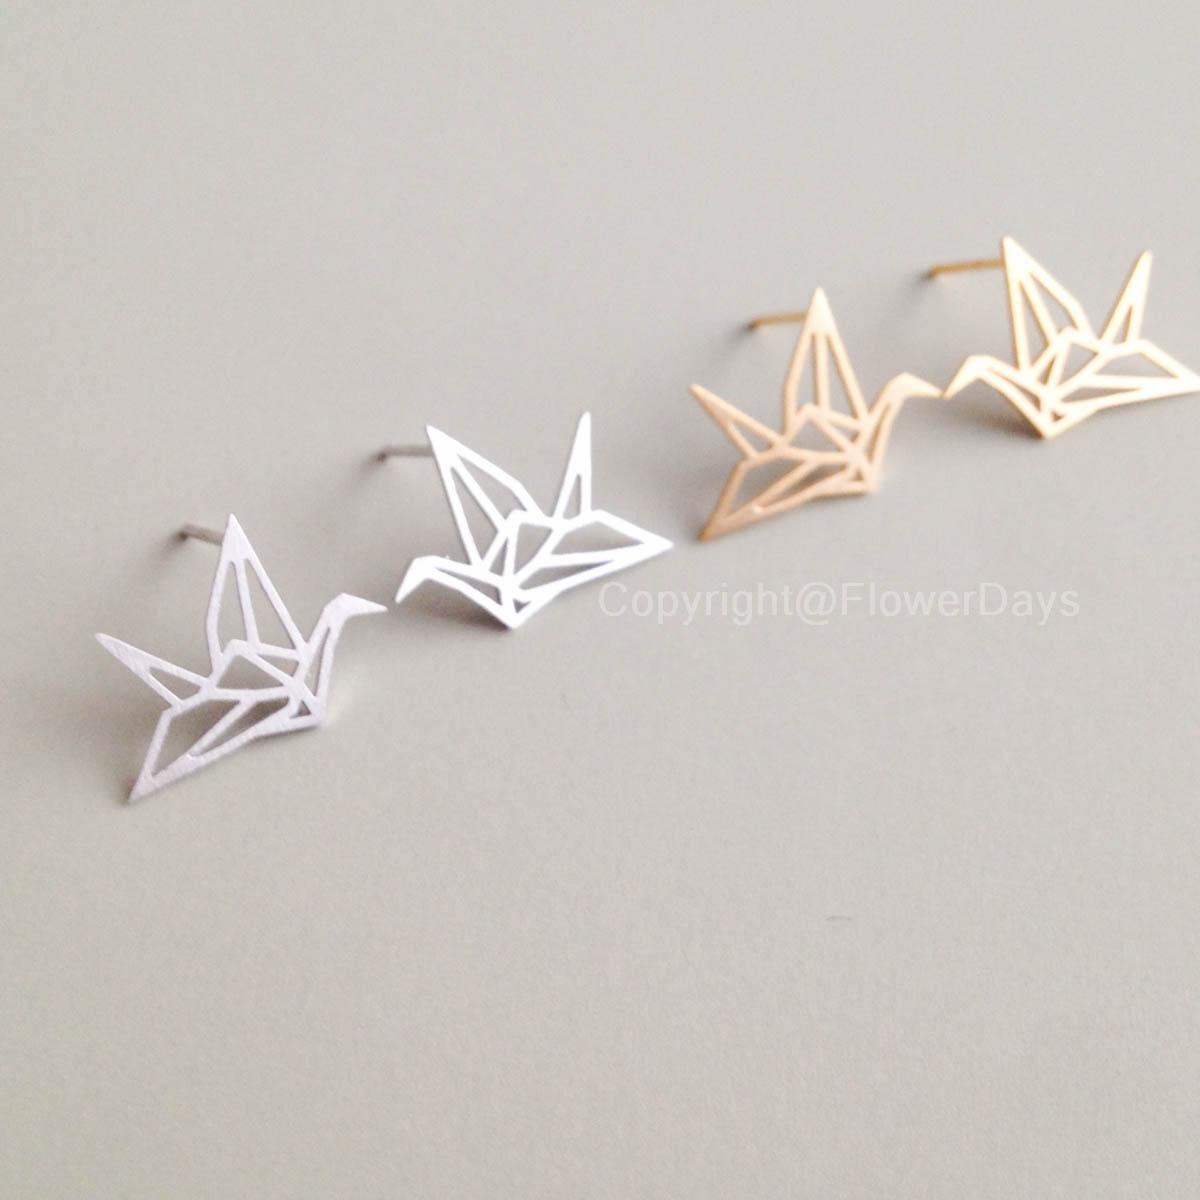 Origami Crane Necklace on Storenvy - photo#34